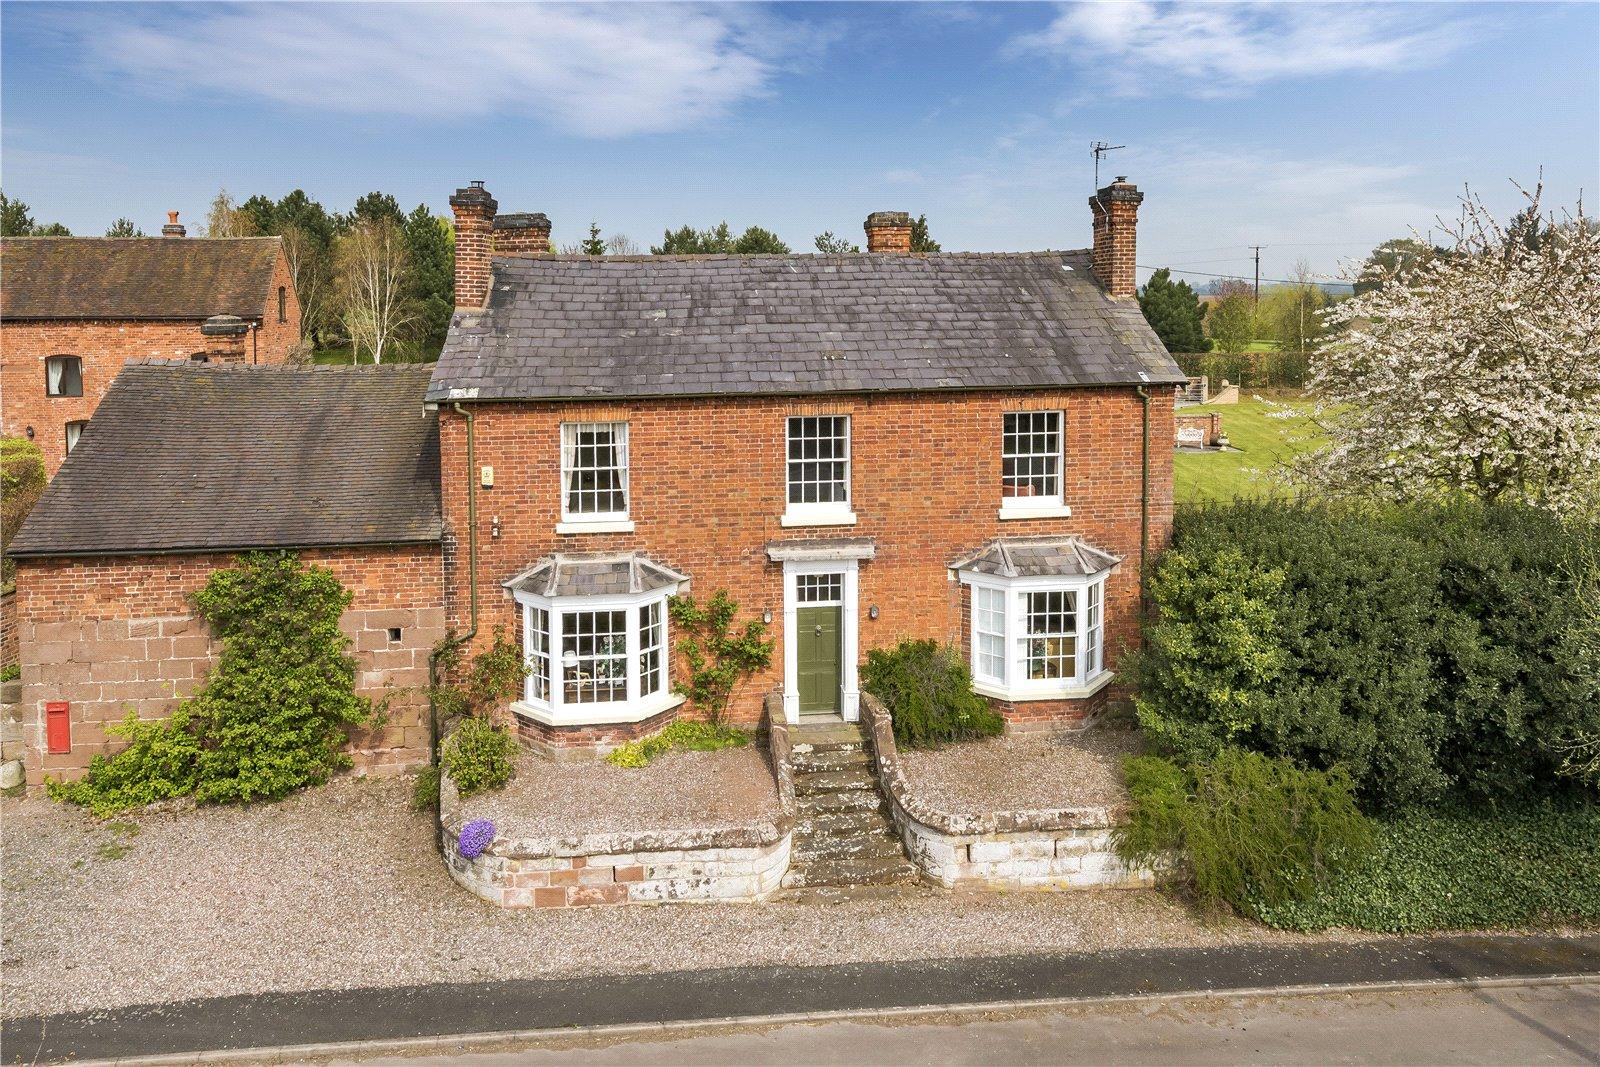 The Manor, Standford Bridge, Chester Road, Newport, Shropshire, TF10